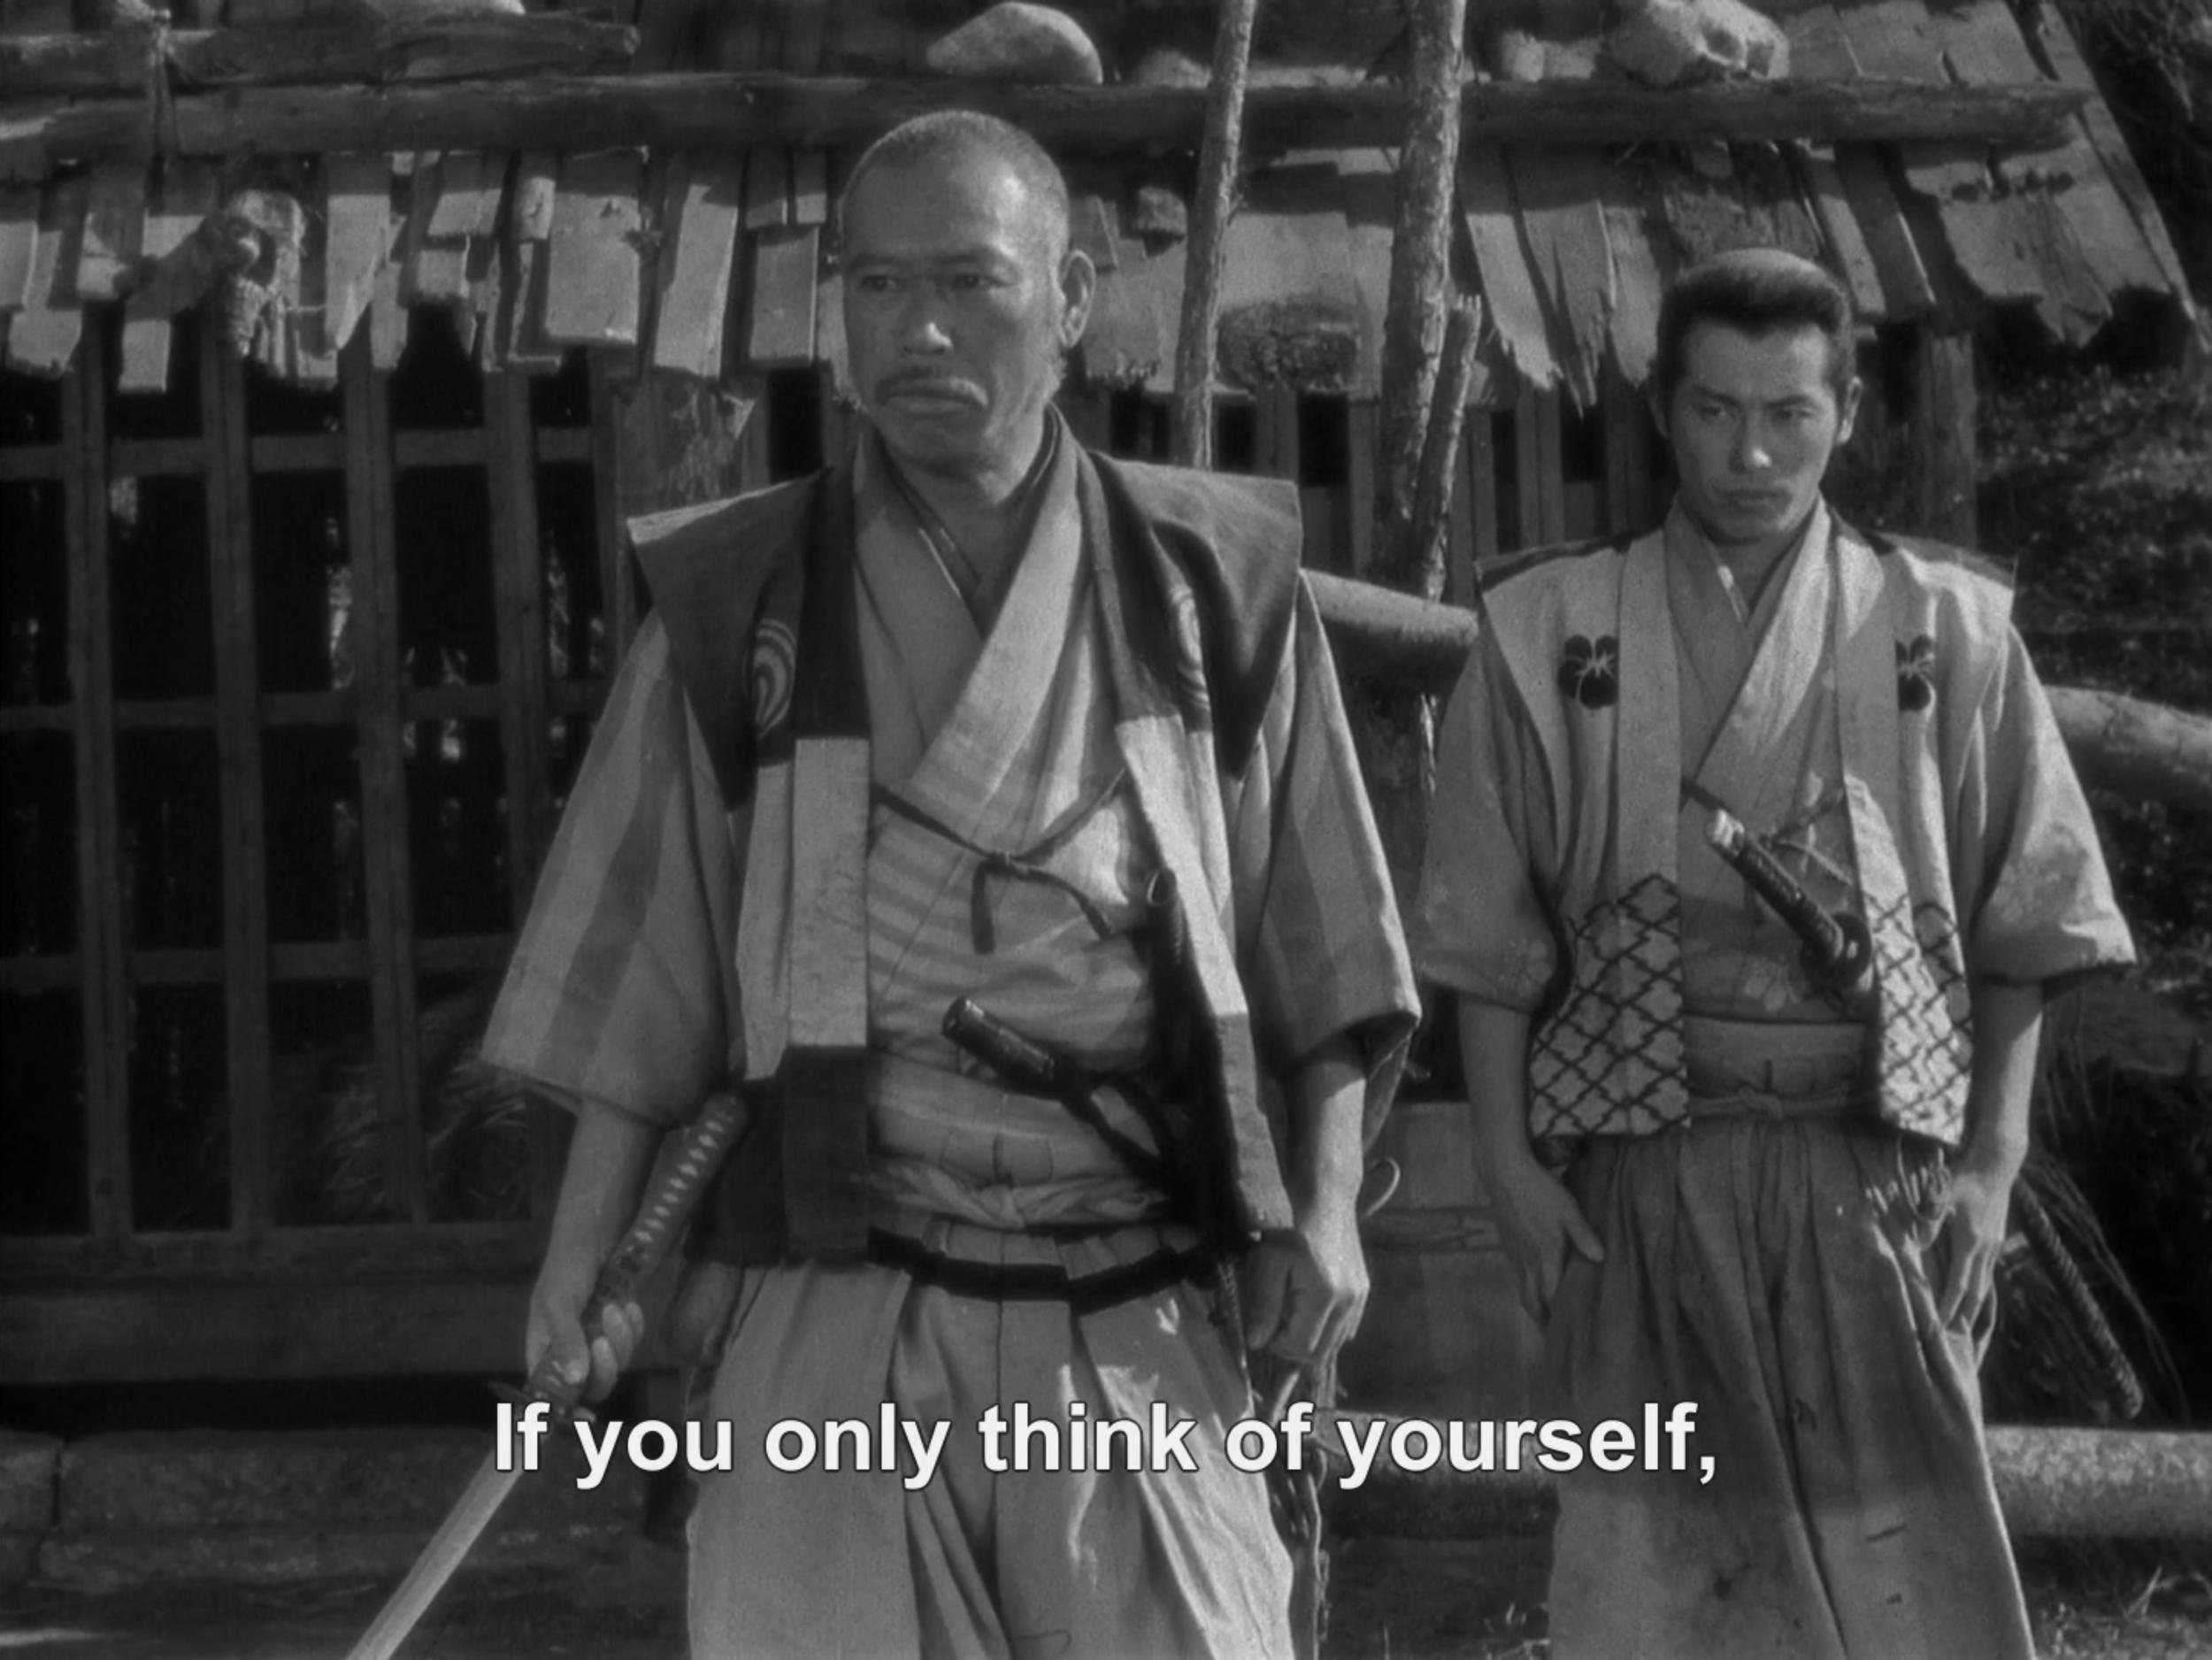 Akira Kurosawa S Seven Samurai By Protecting Others You Save Yourself A Bittersweet Life Studios